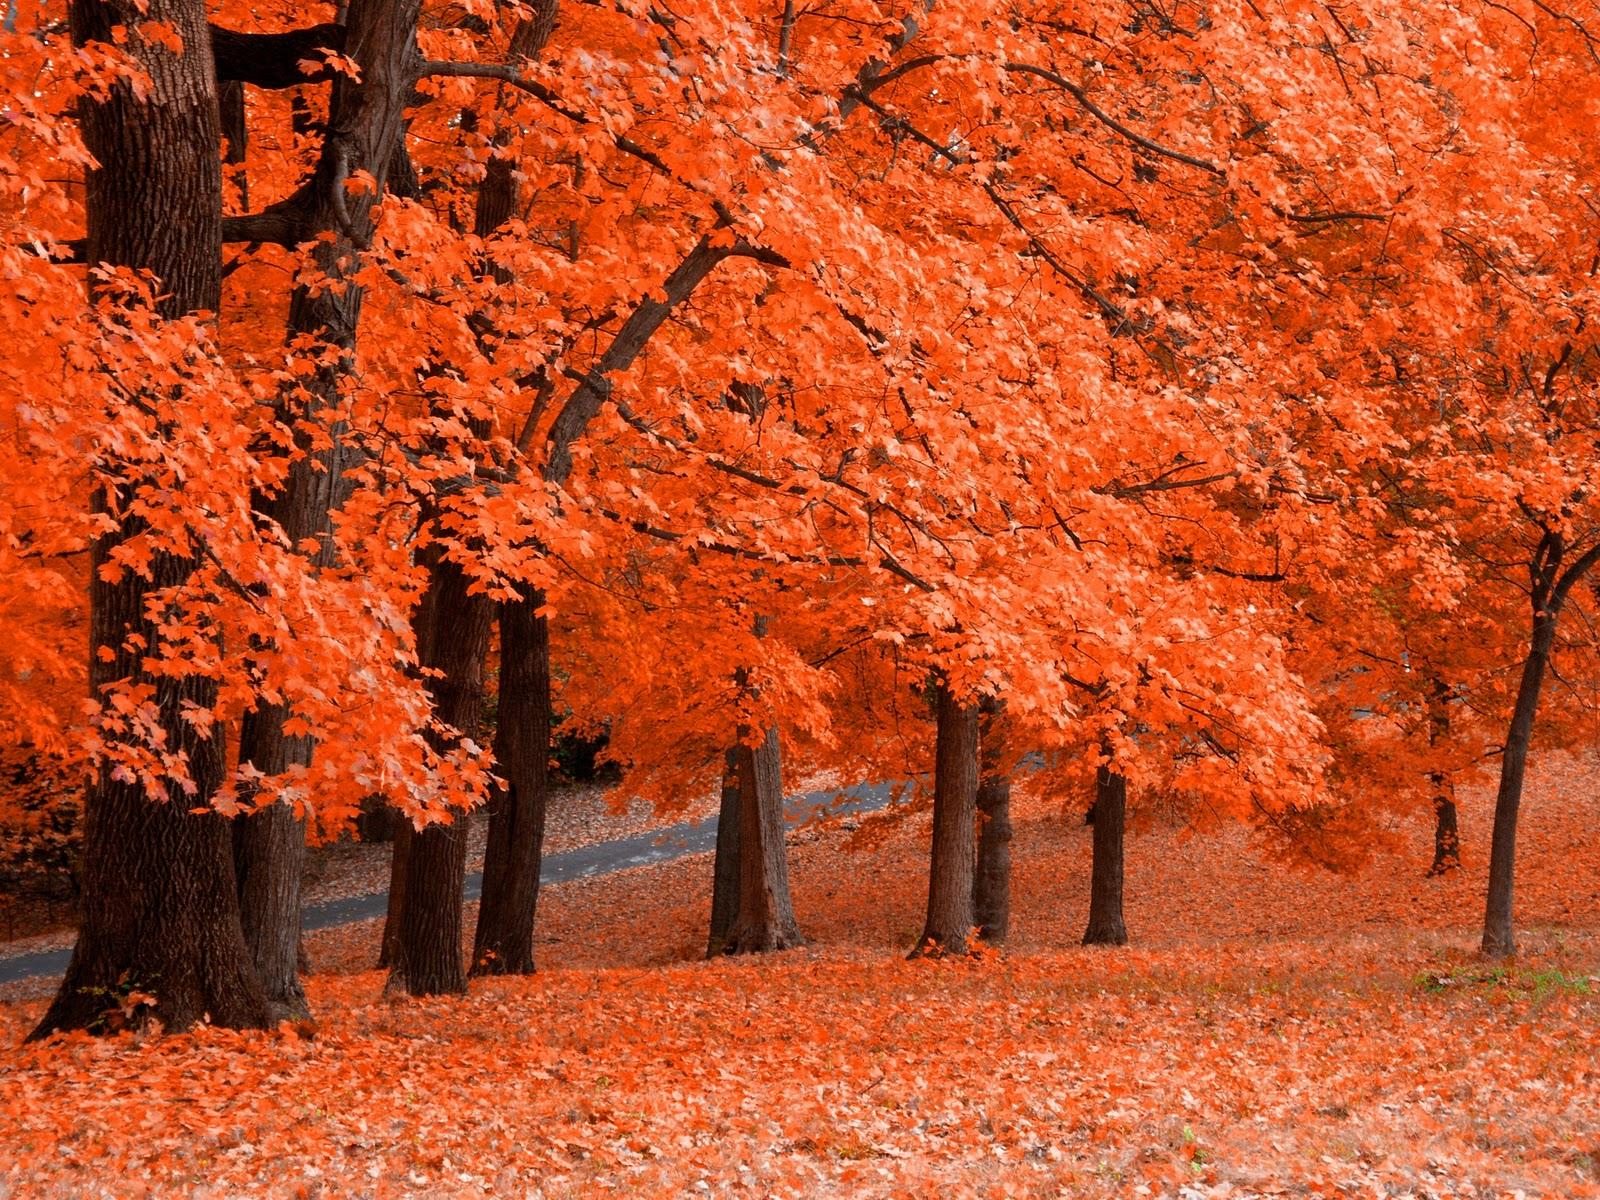 The best top autumn desktop wallpapers 18 En Güzel Sonbahar HD Duvar Kağıtları